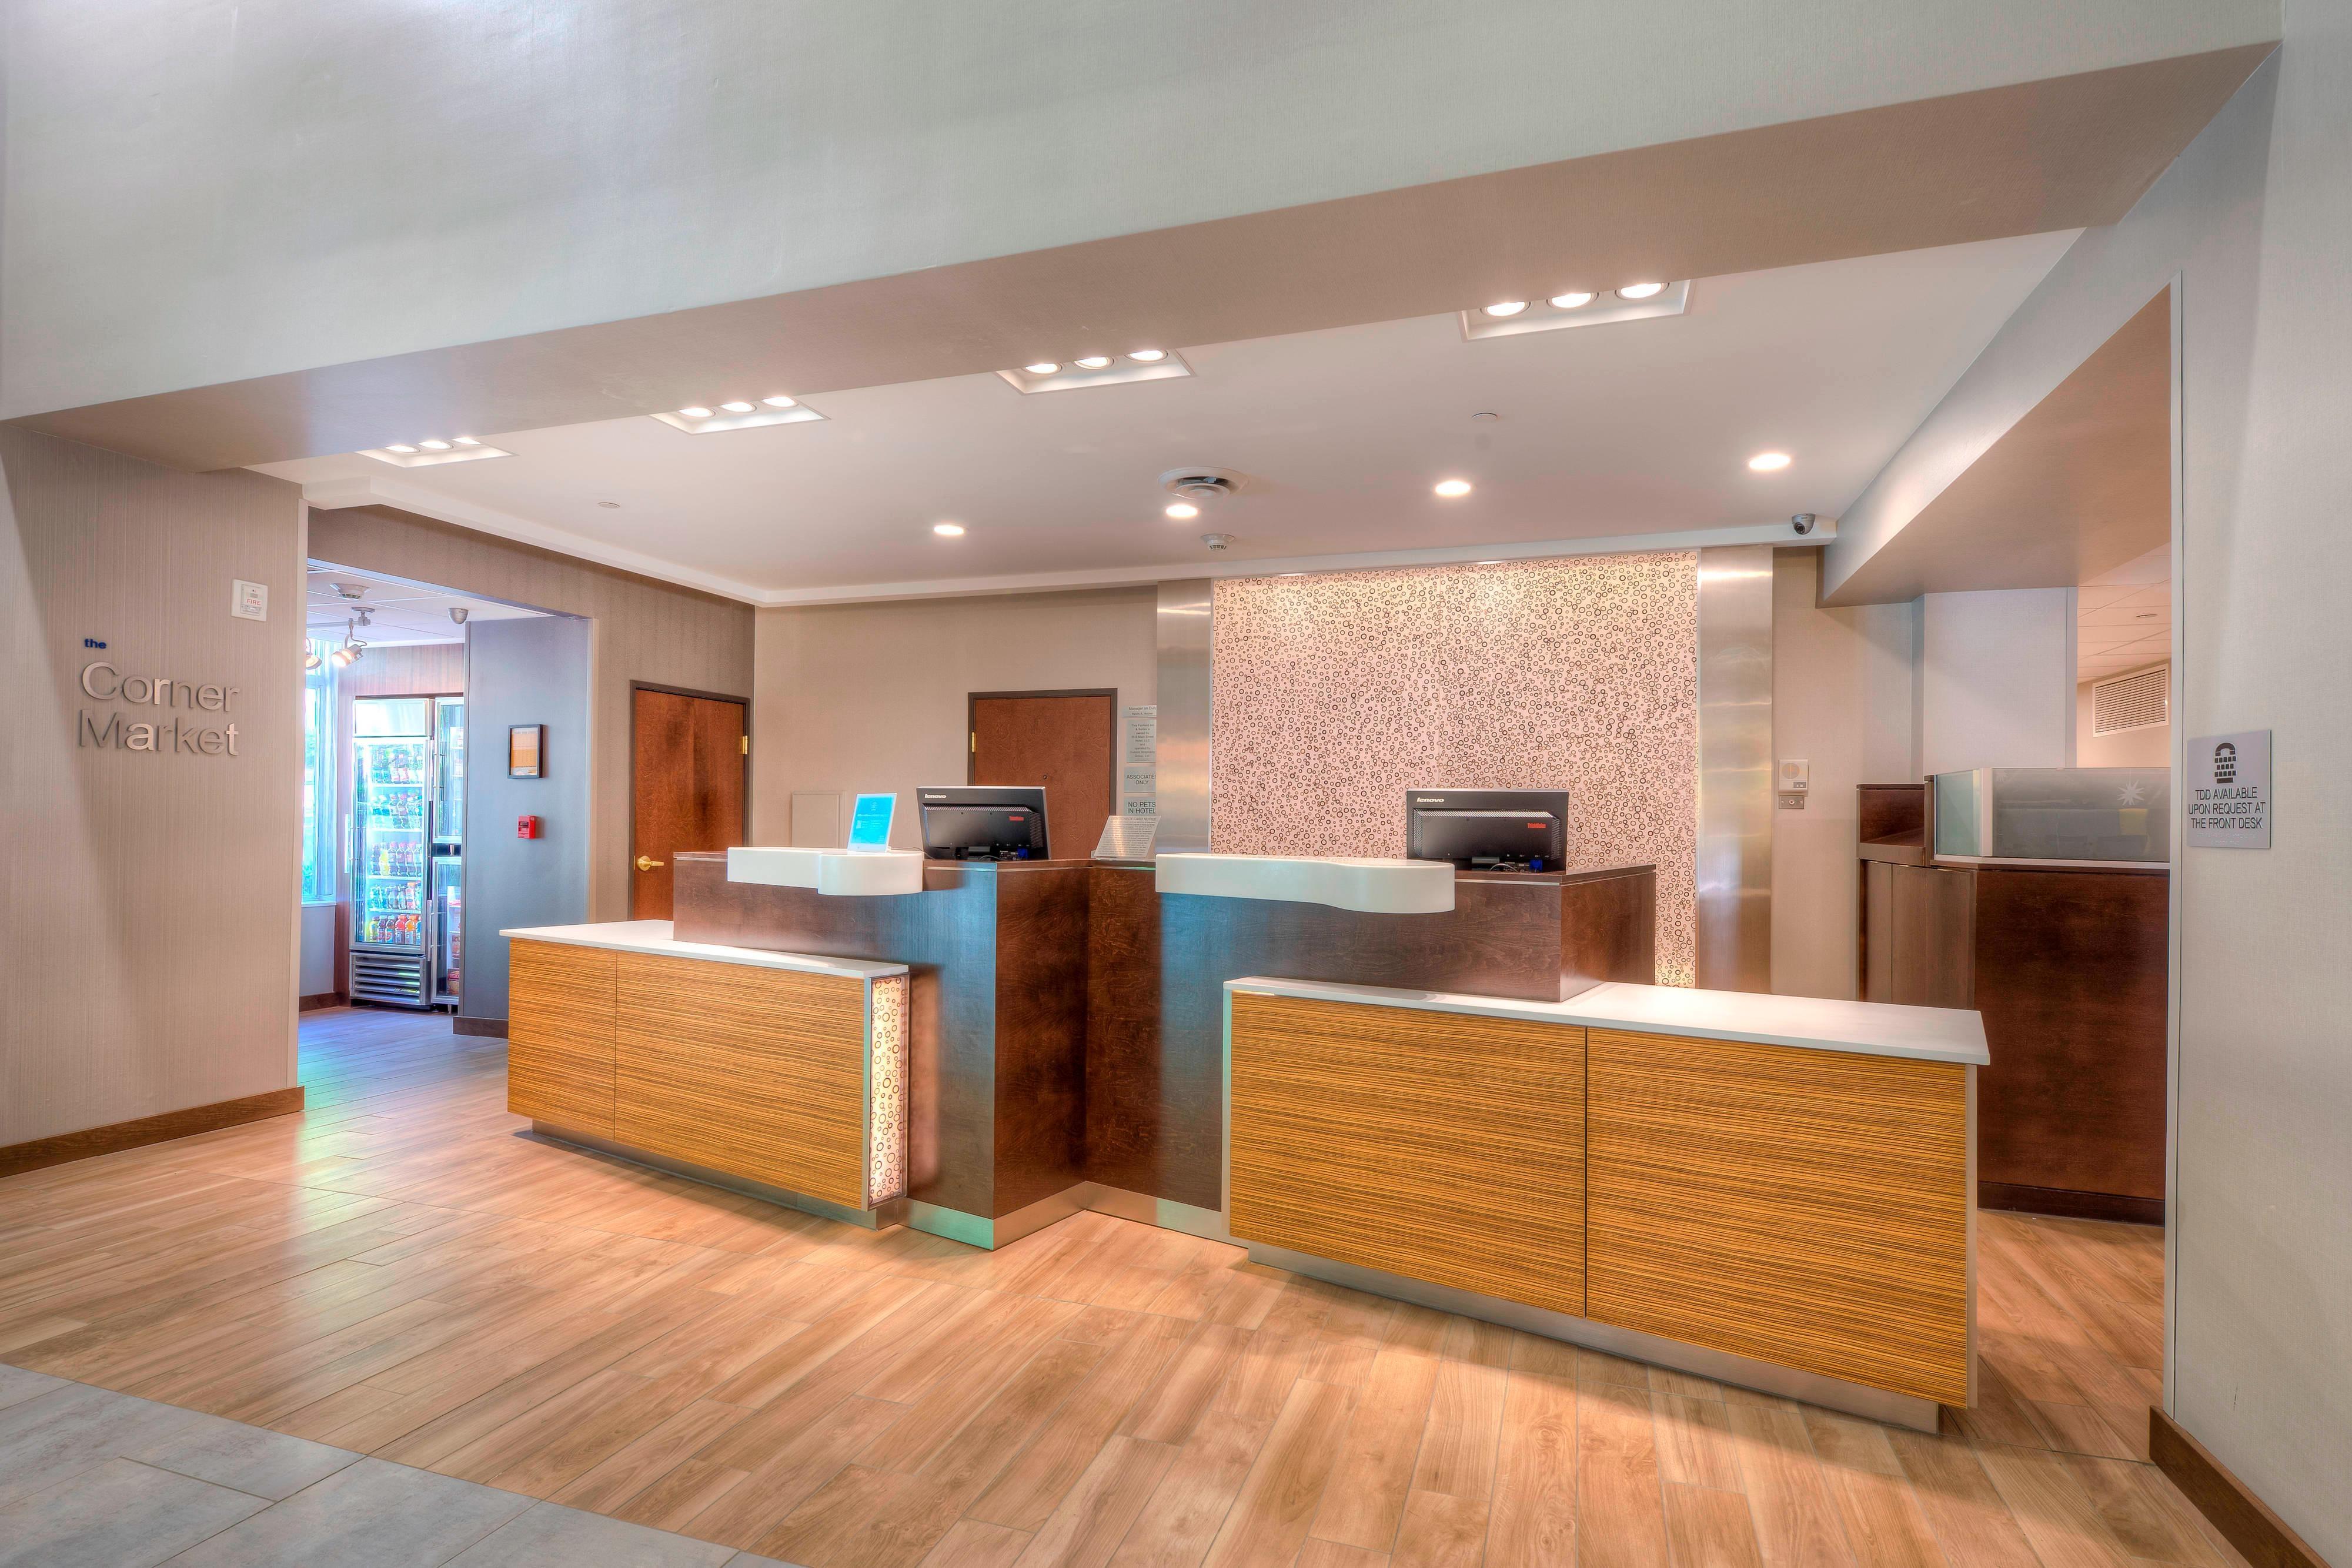 Fairfield Inn & Suites Front Desk